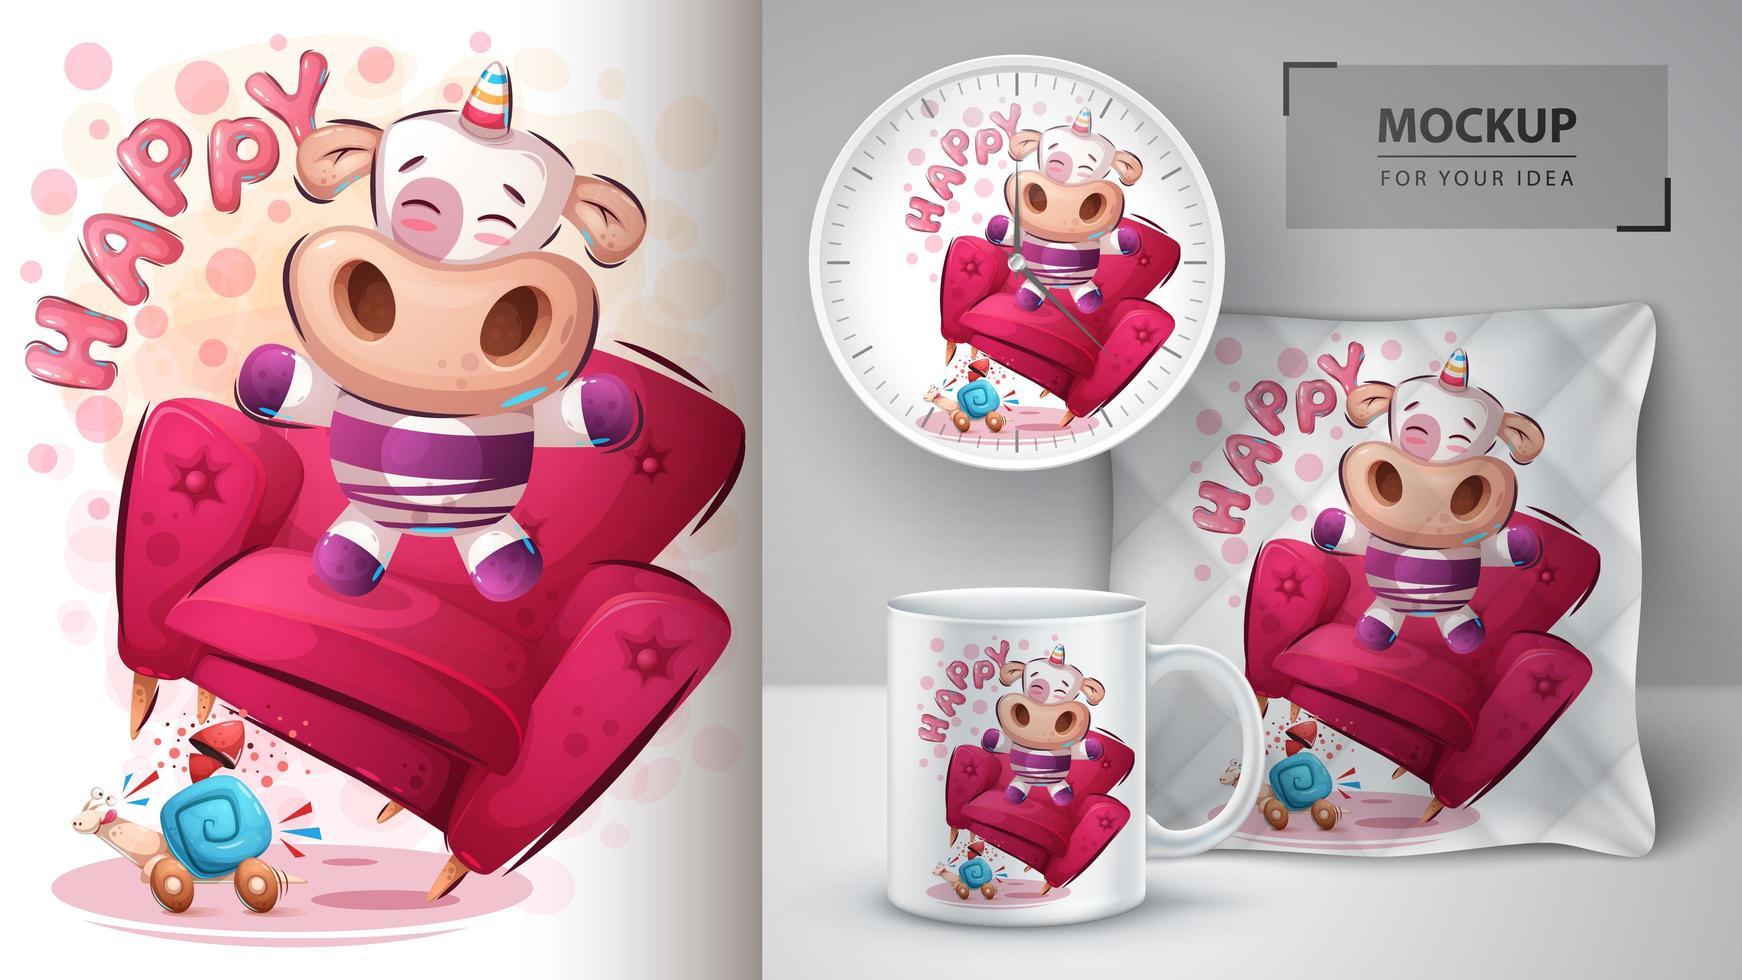 feliz unicornio póster y merchandising vector